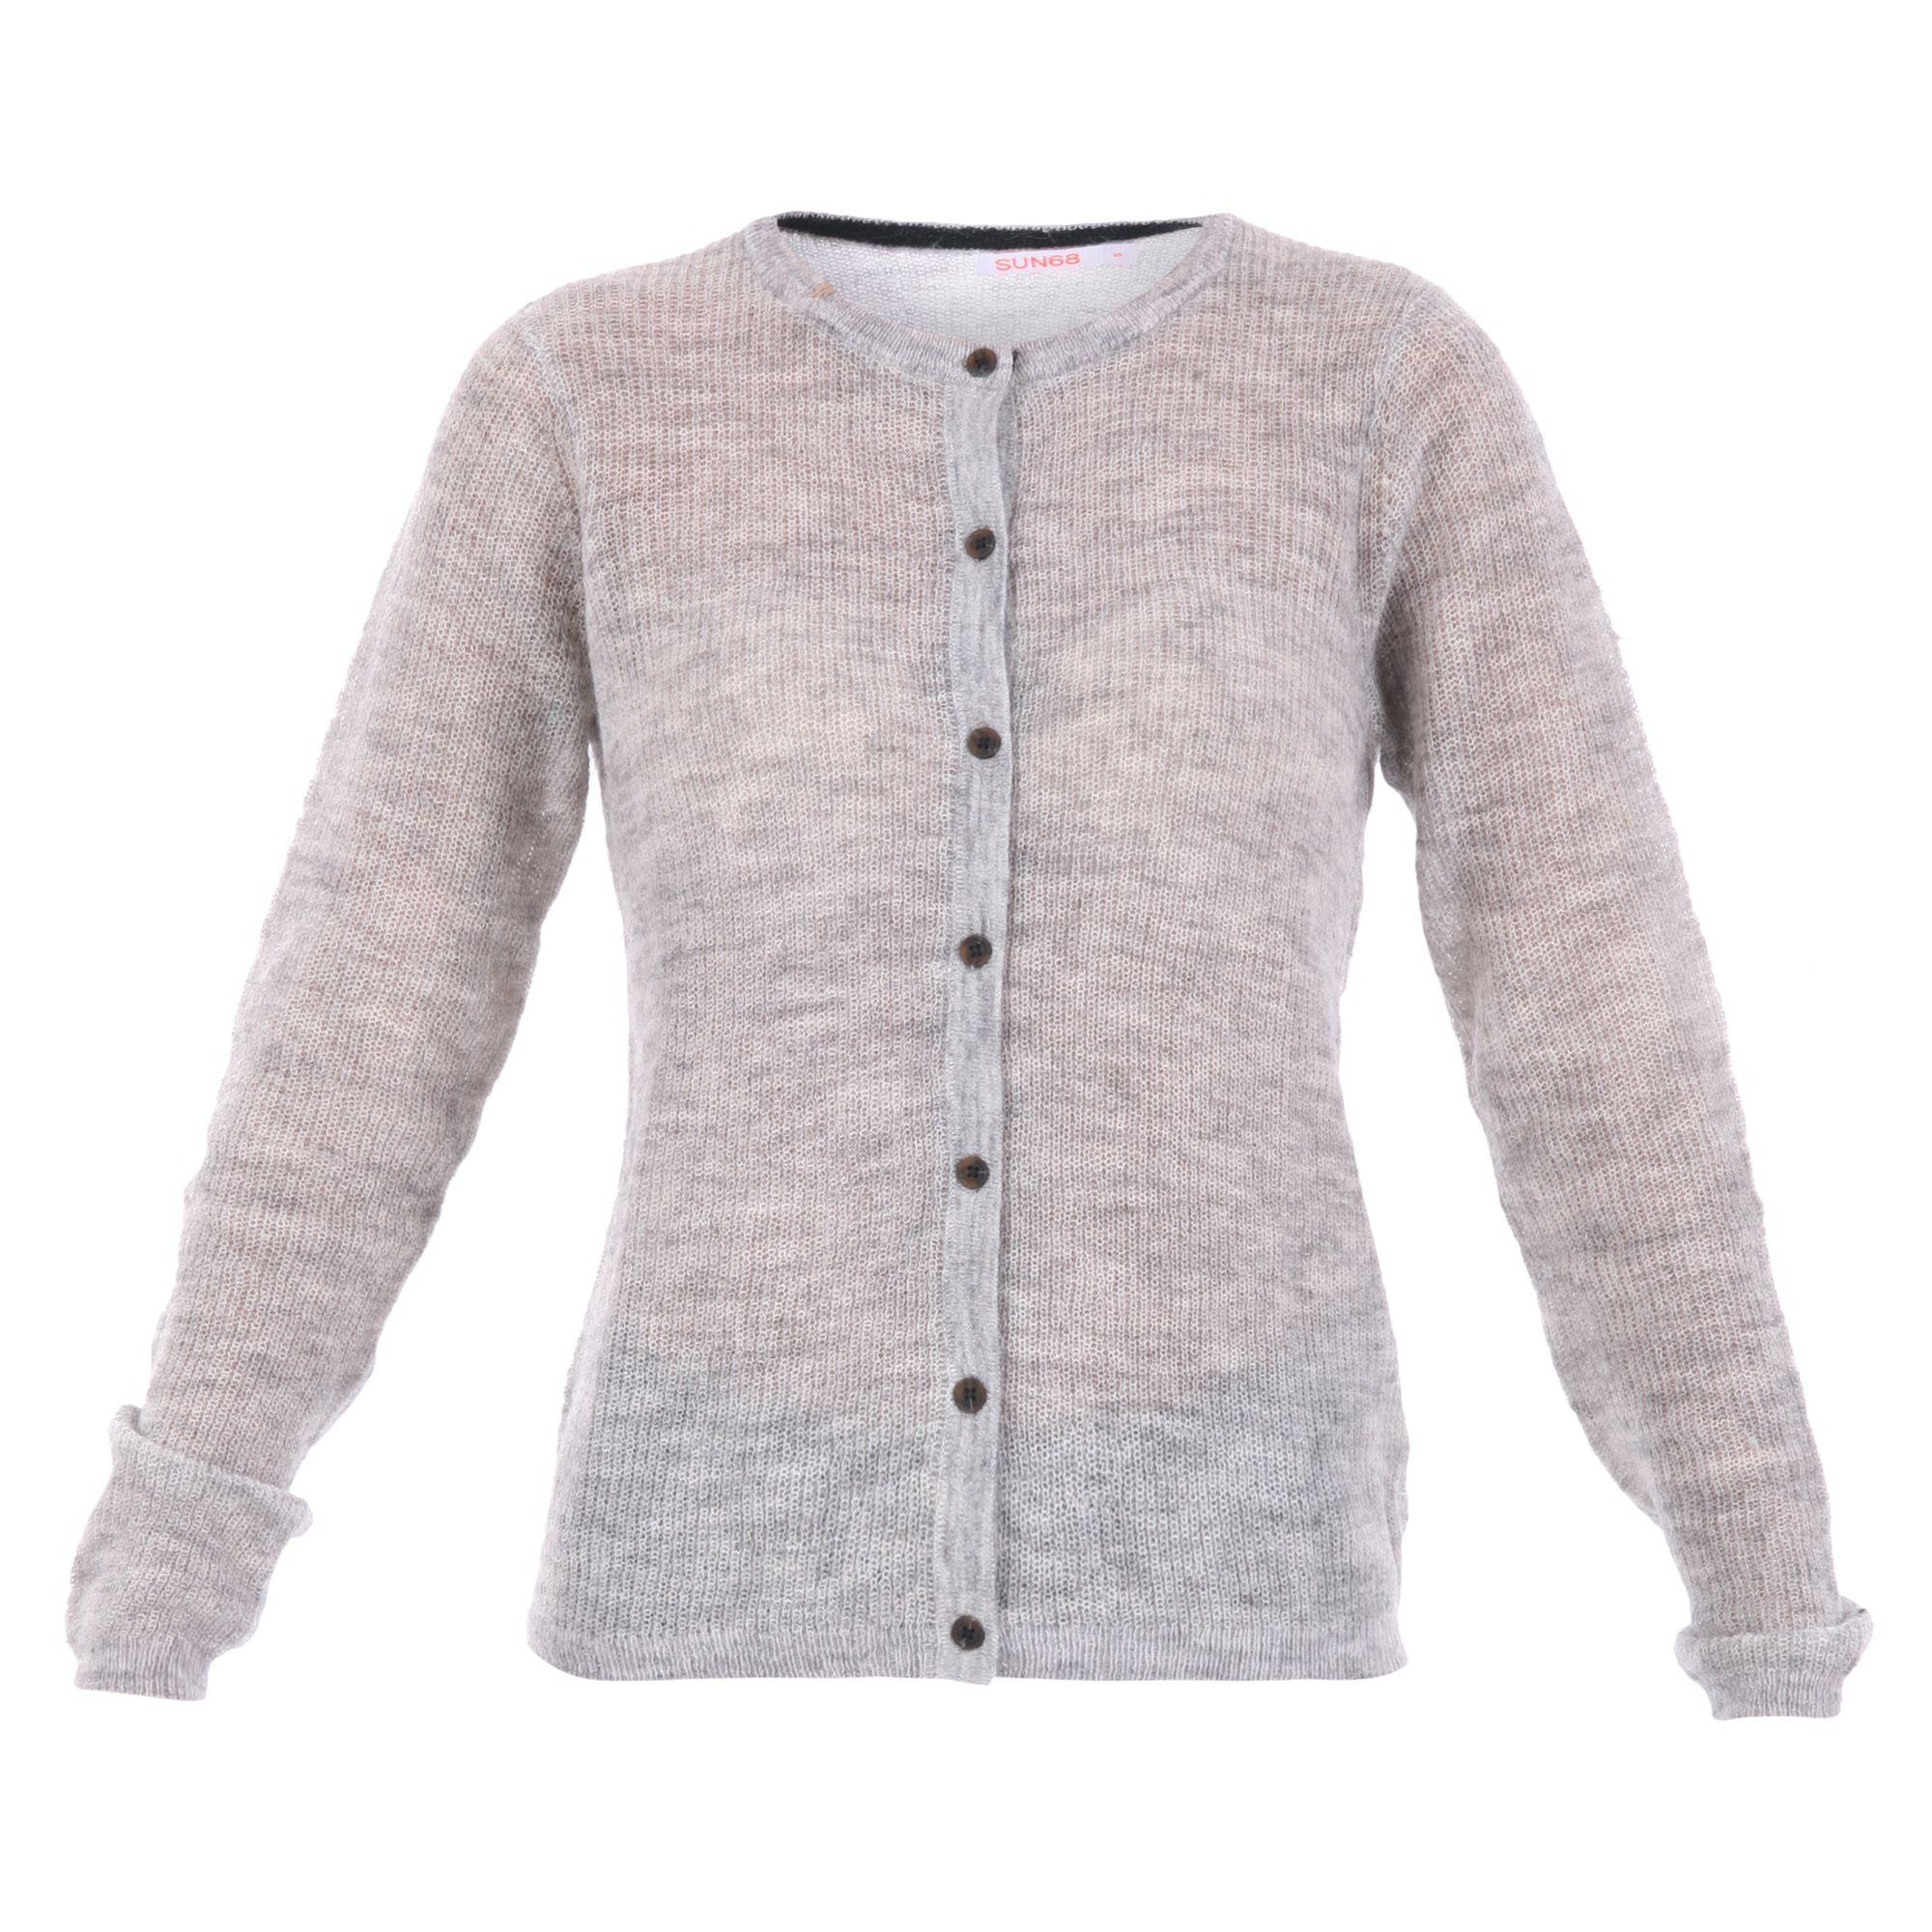 Sun 68 Wool-alpaca Blend Cardigan Sweater